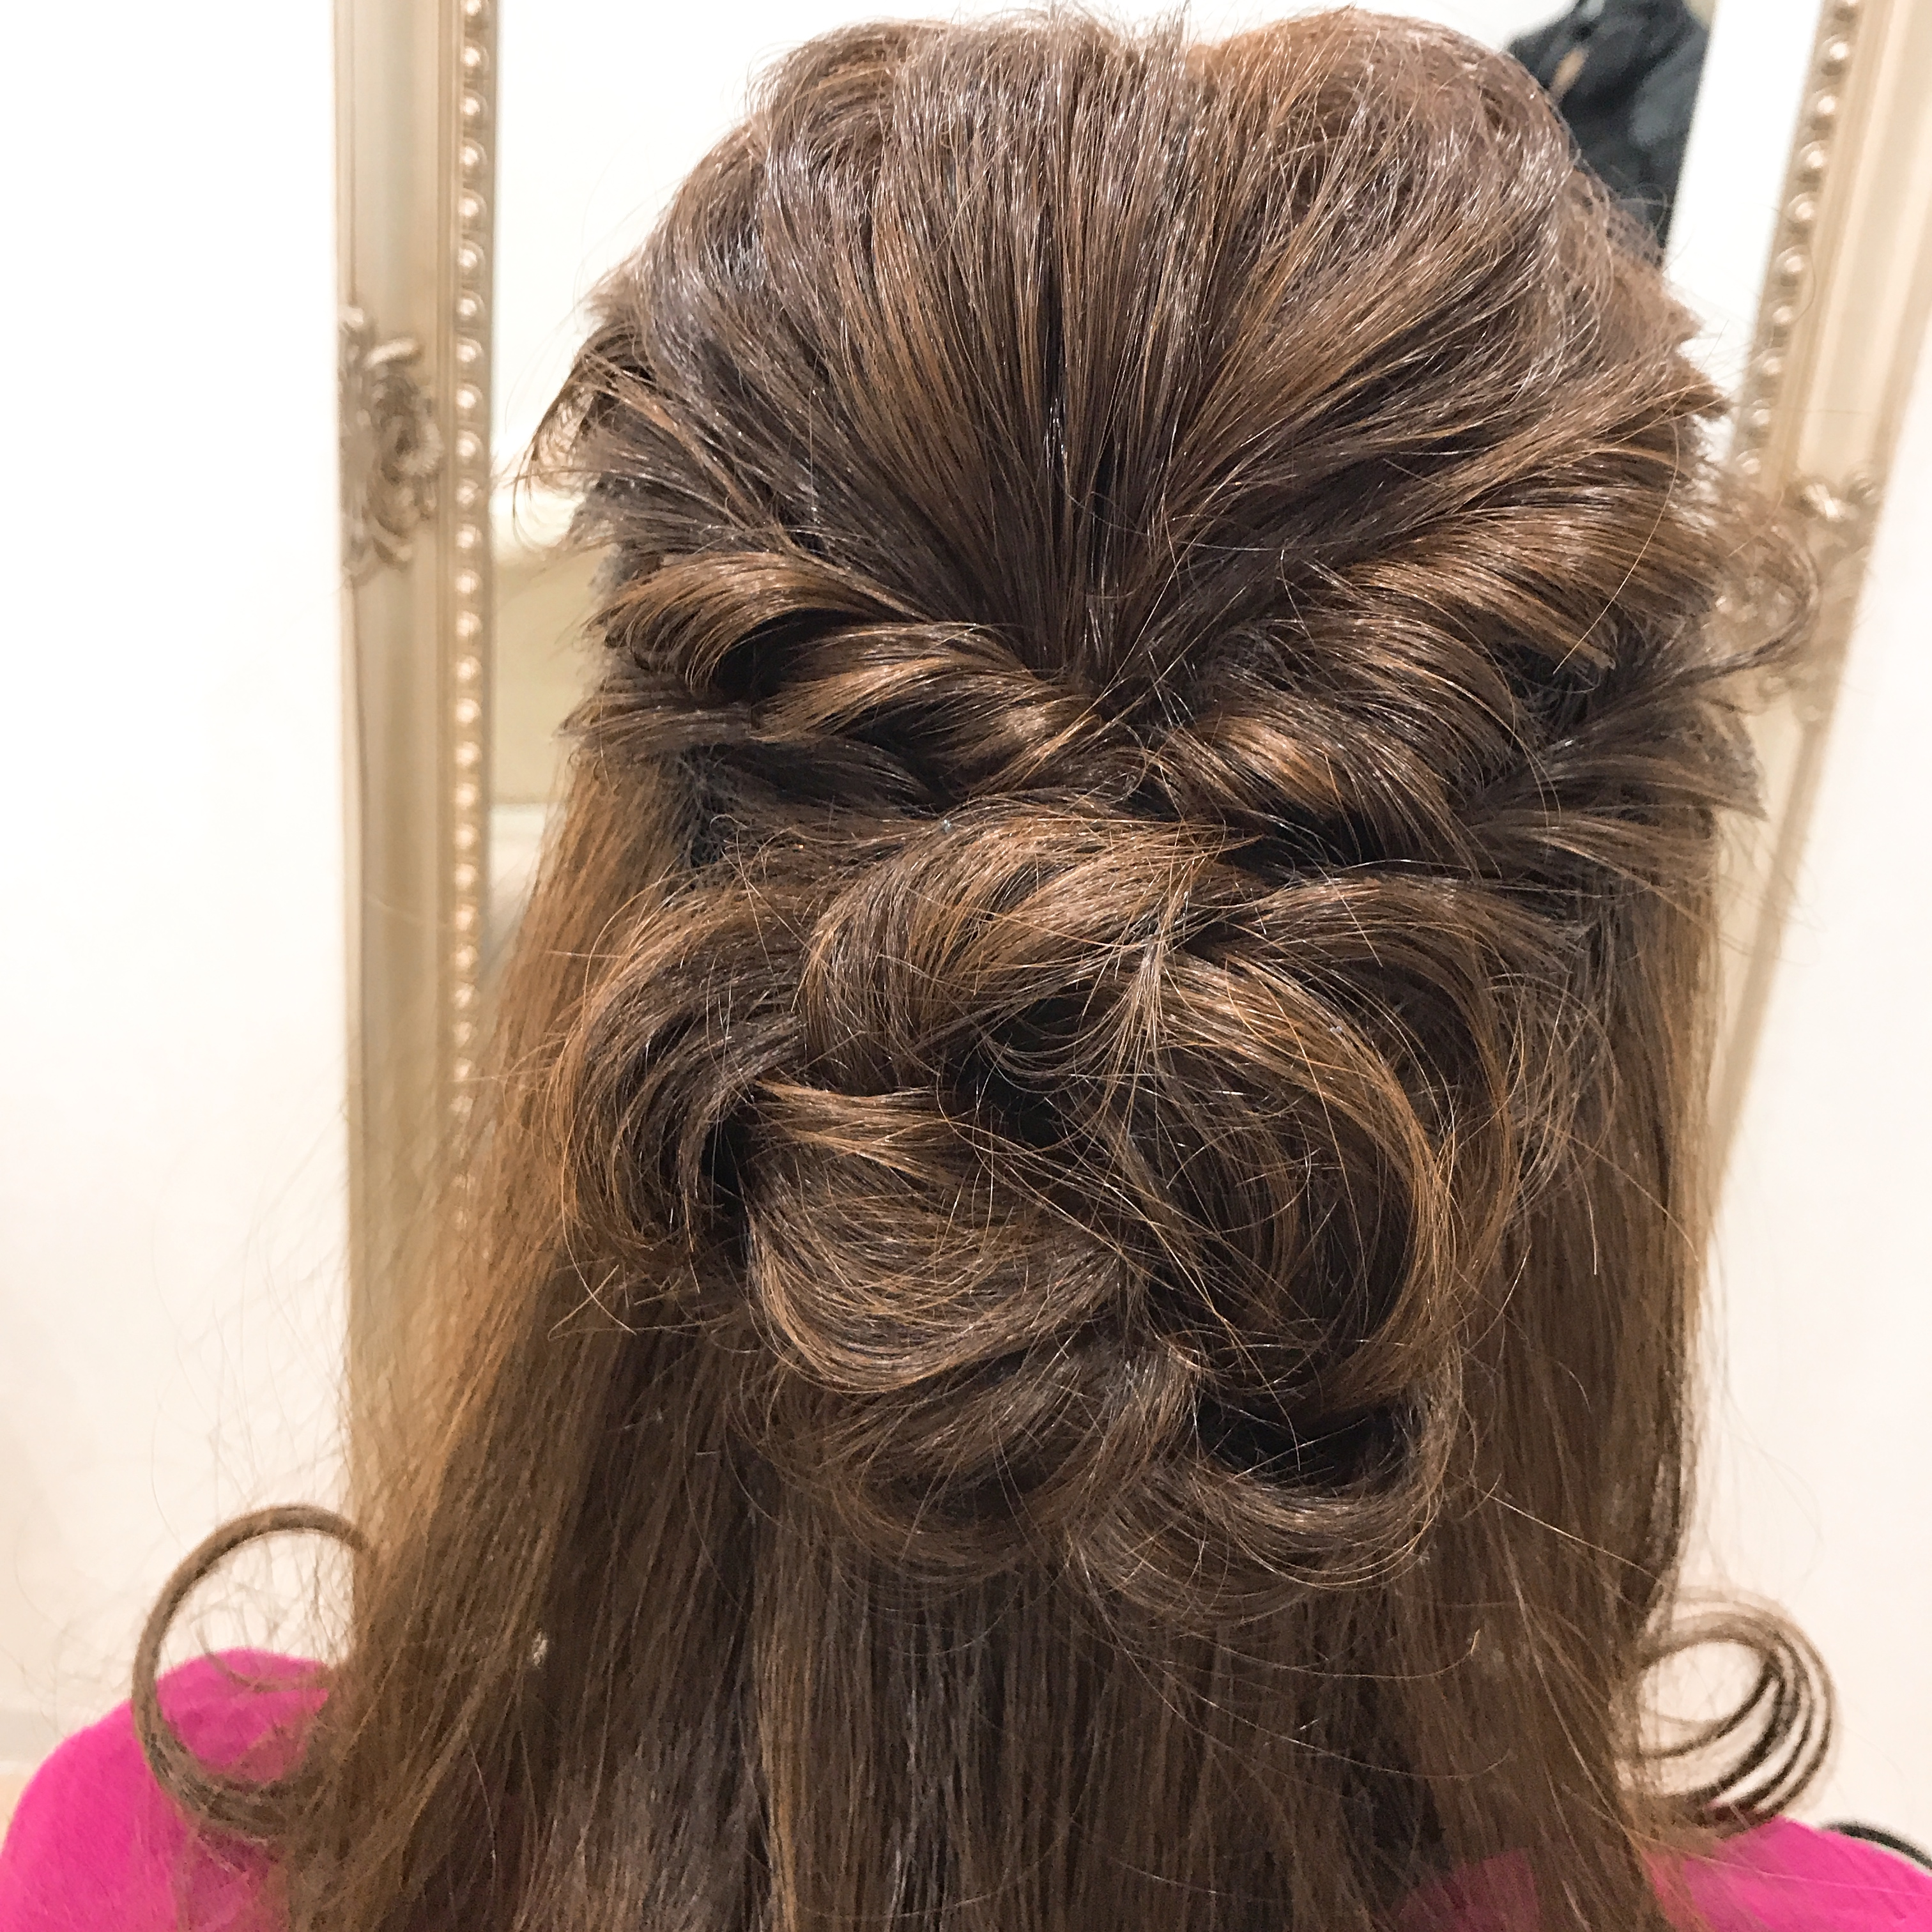 3b6925350244c 結婚式のヘアアレンジ、新婦母上様編 - アクアドール店舗ブログ